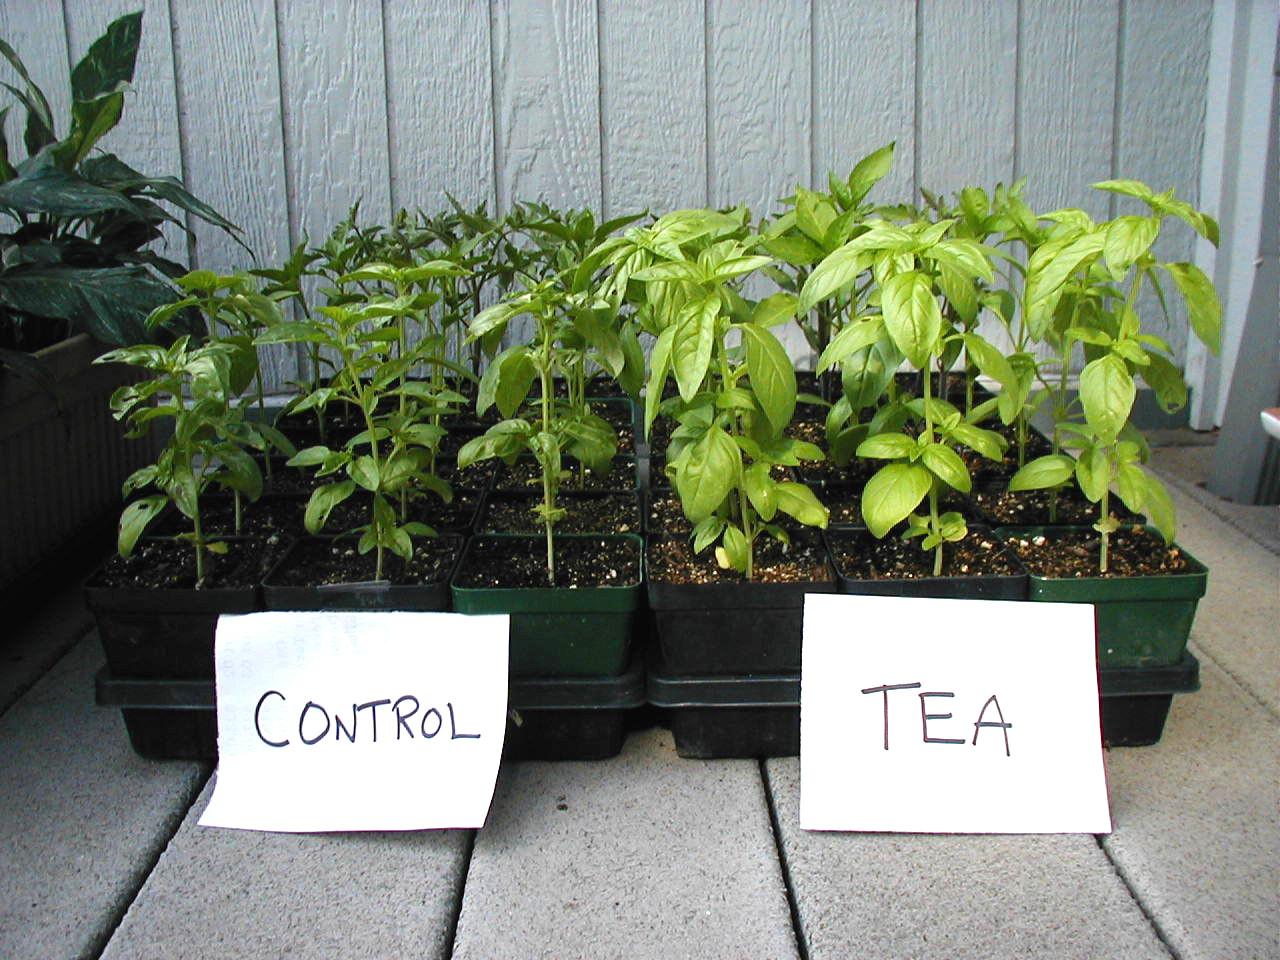 compost tea is good for you  - Basil plants